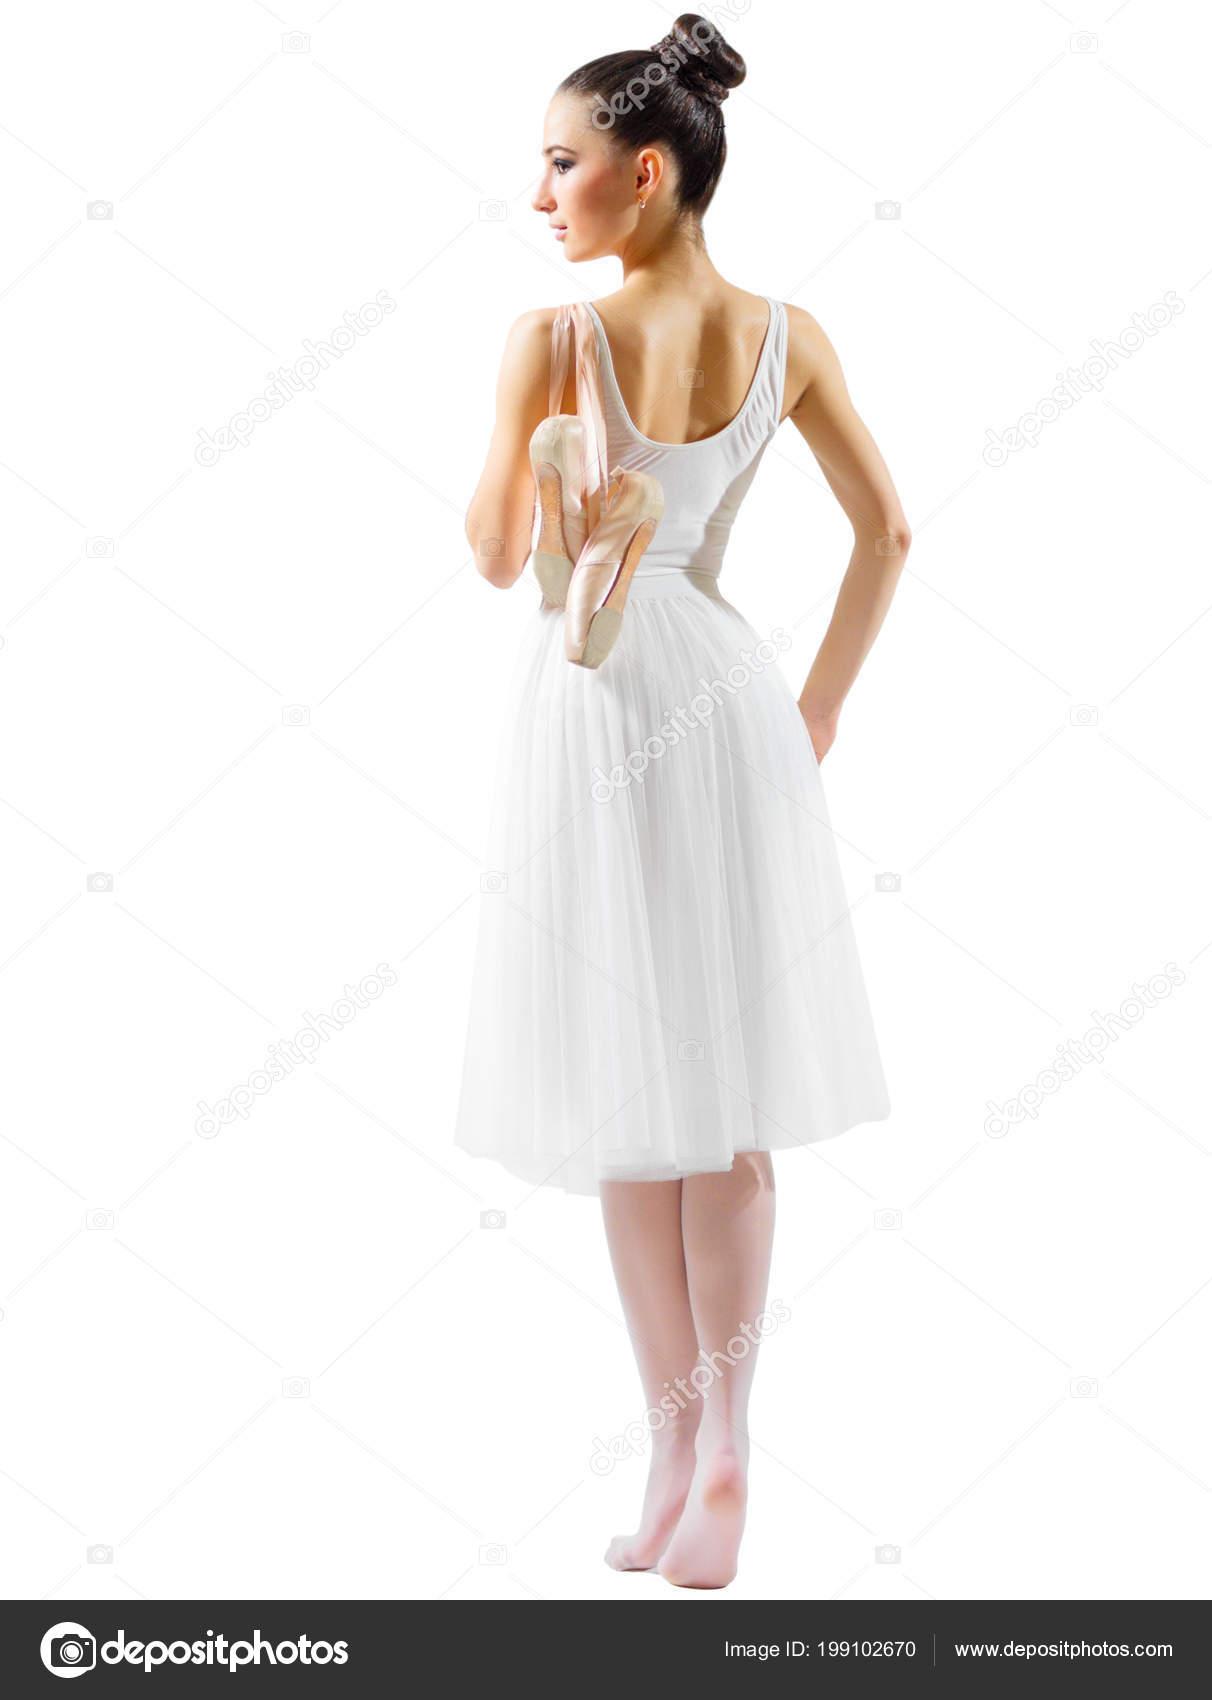 young-girl-ballerina-models